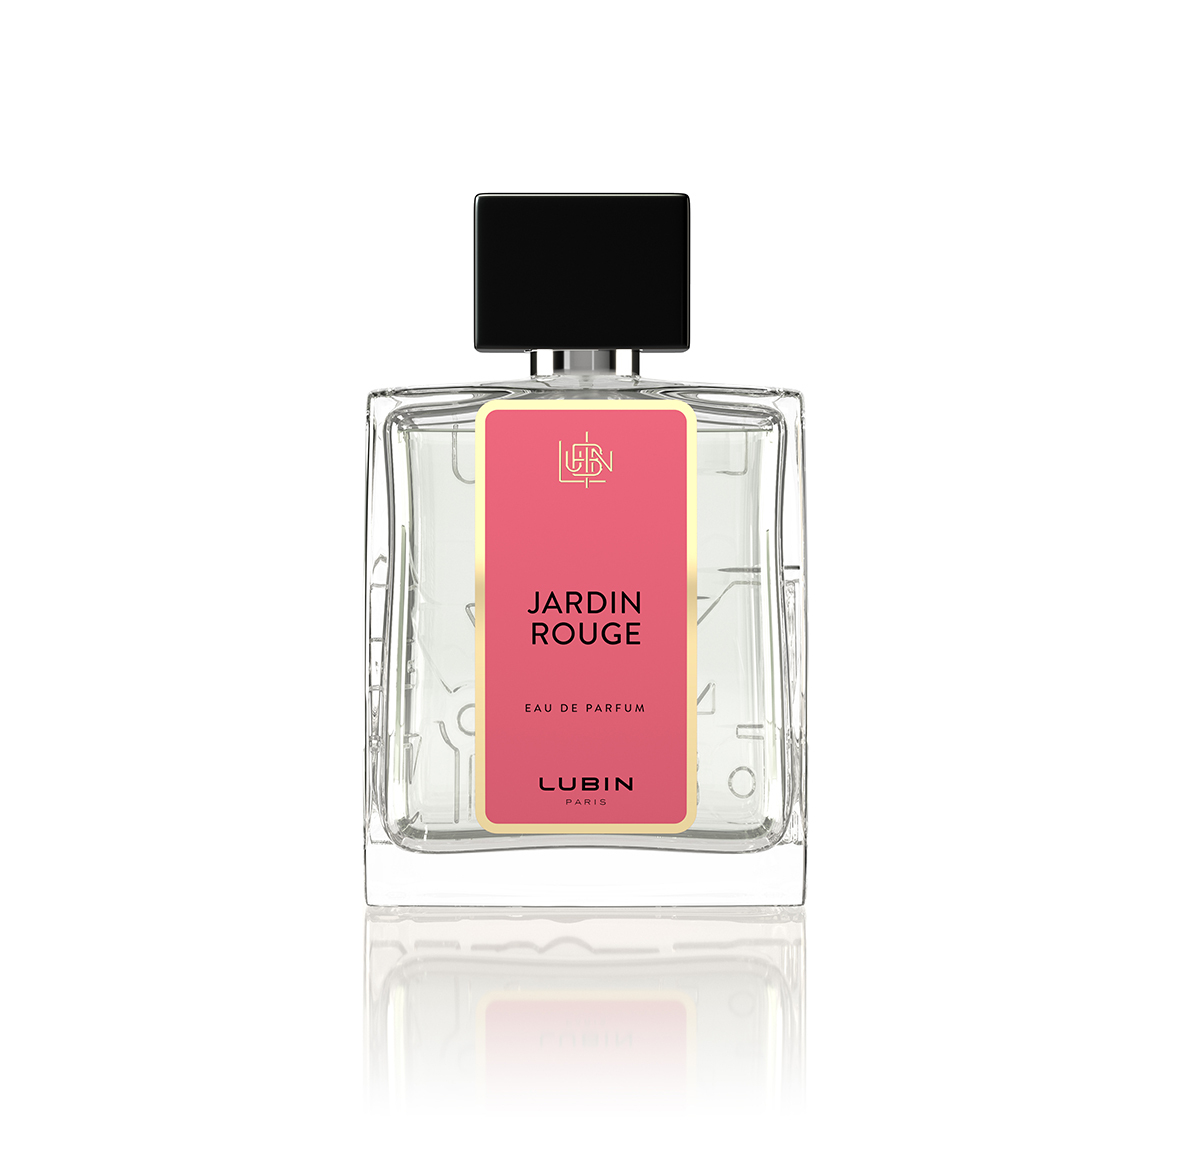 Jardin Rouge 75Ml Edp Spray | Pulse Of Perfumery pour Malle De Jardin